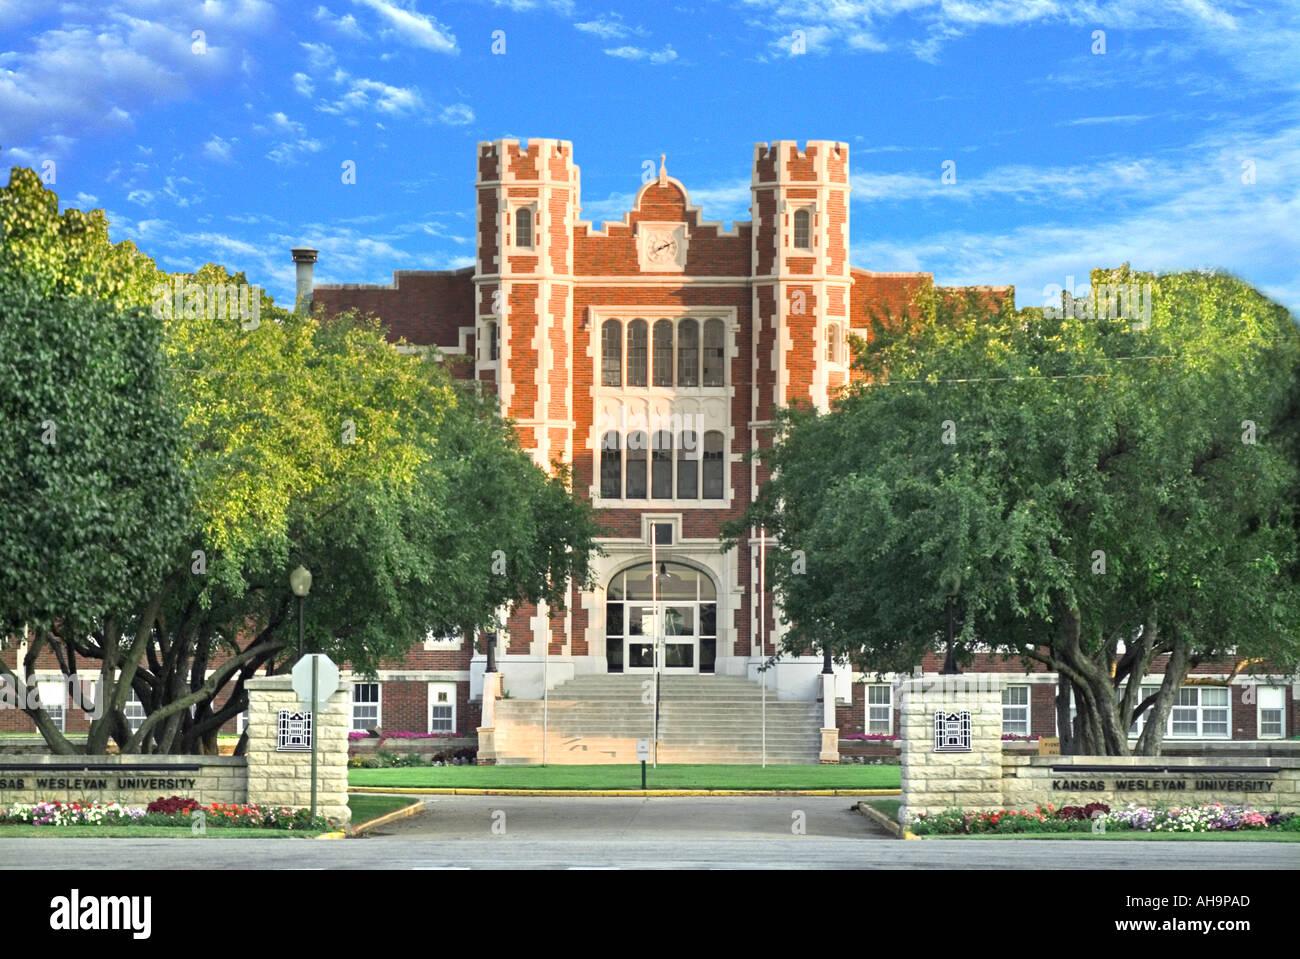 Kansas Wesleyan University >> Kansas Wesleyan University Stock Photo 4702892 Alamy